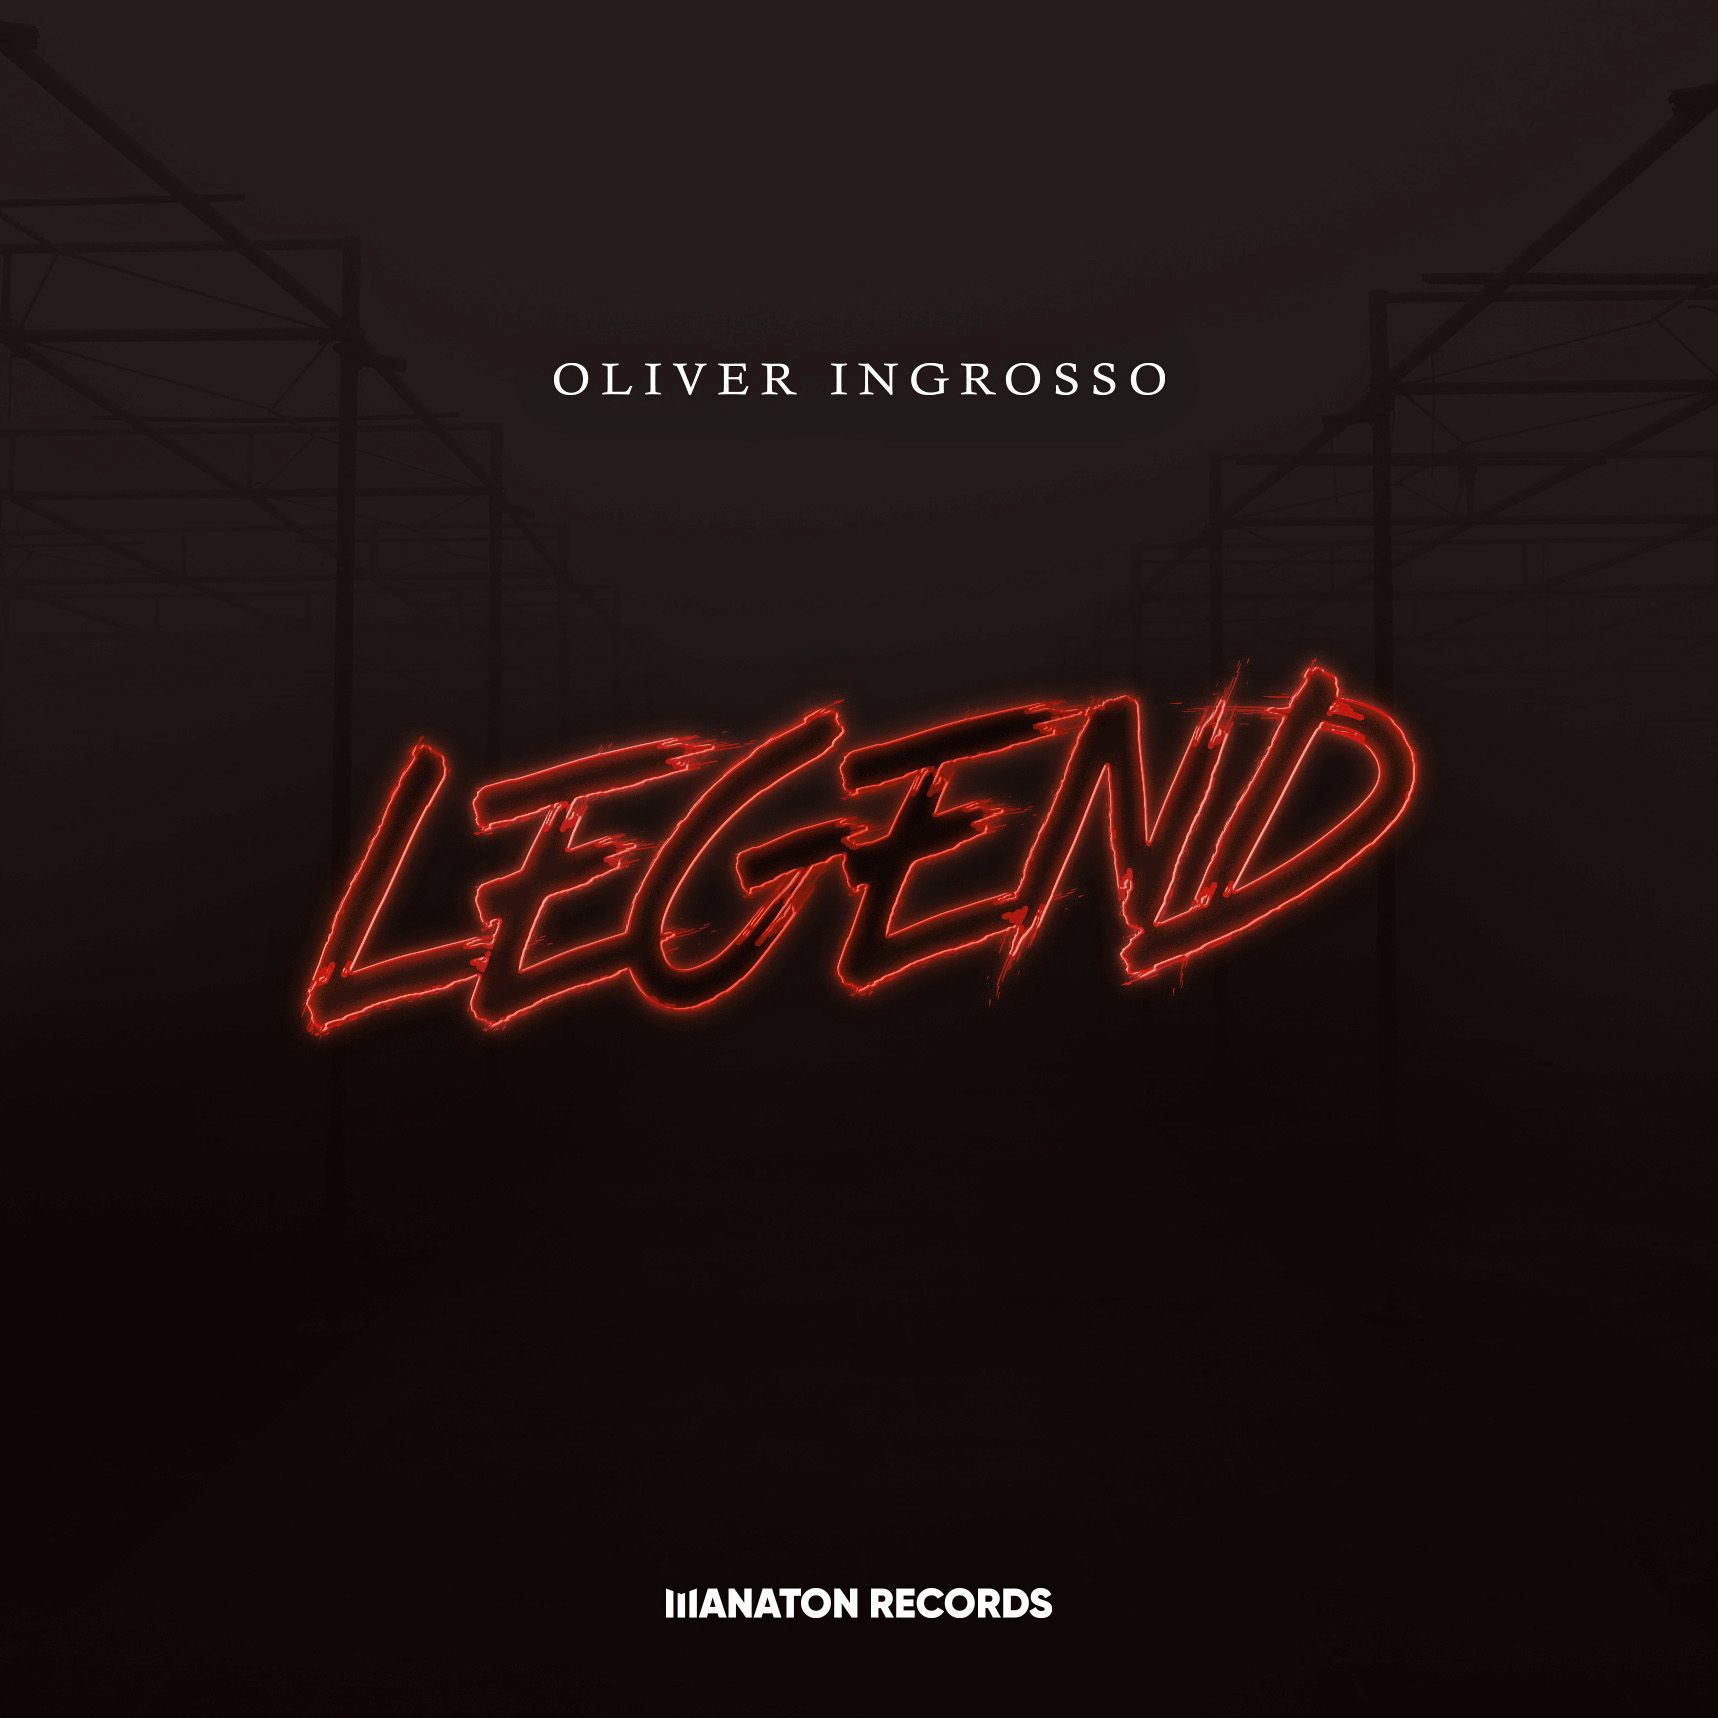 oliver_ingrosso_-_legend_manaton_records.jpg